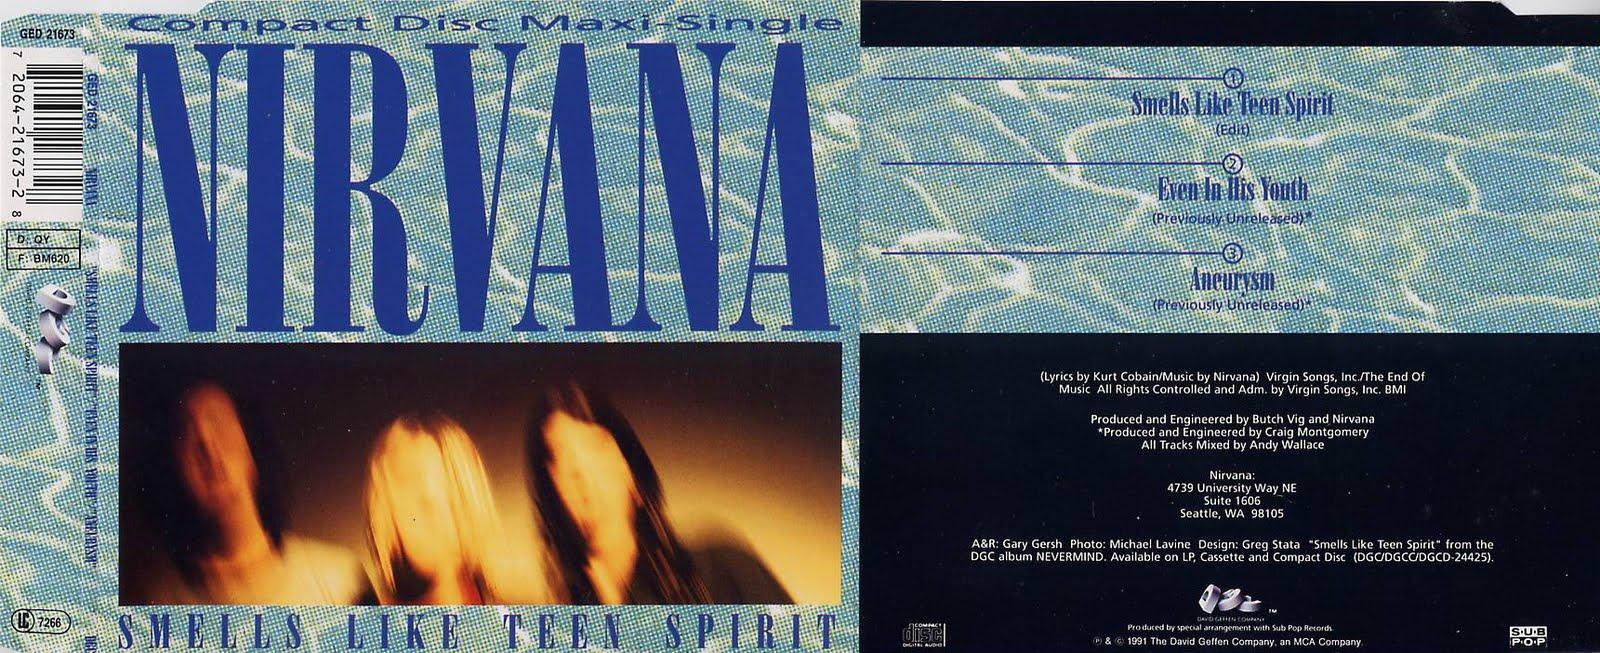 Nirvana Smells Like Teen Spirit Single 108